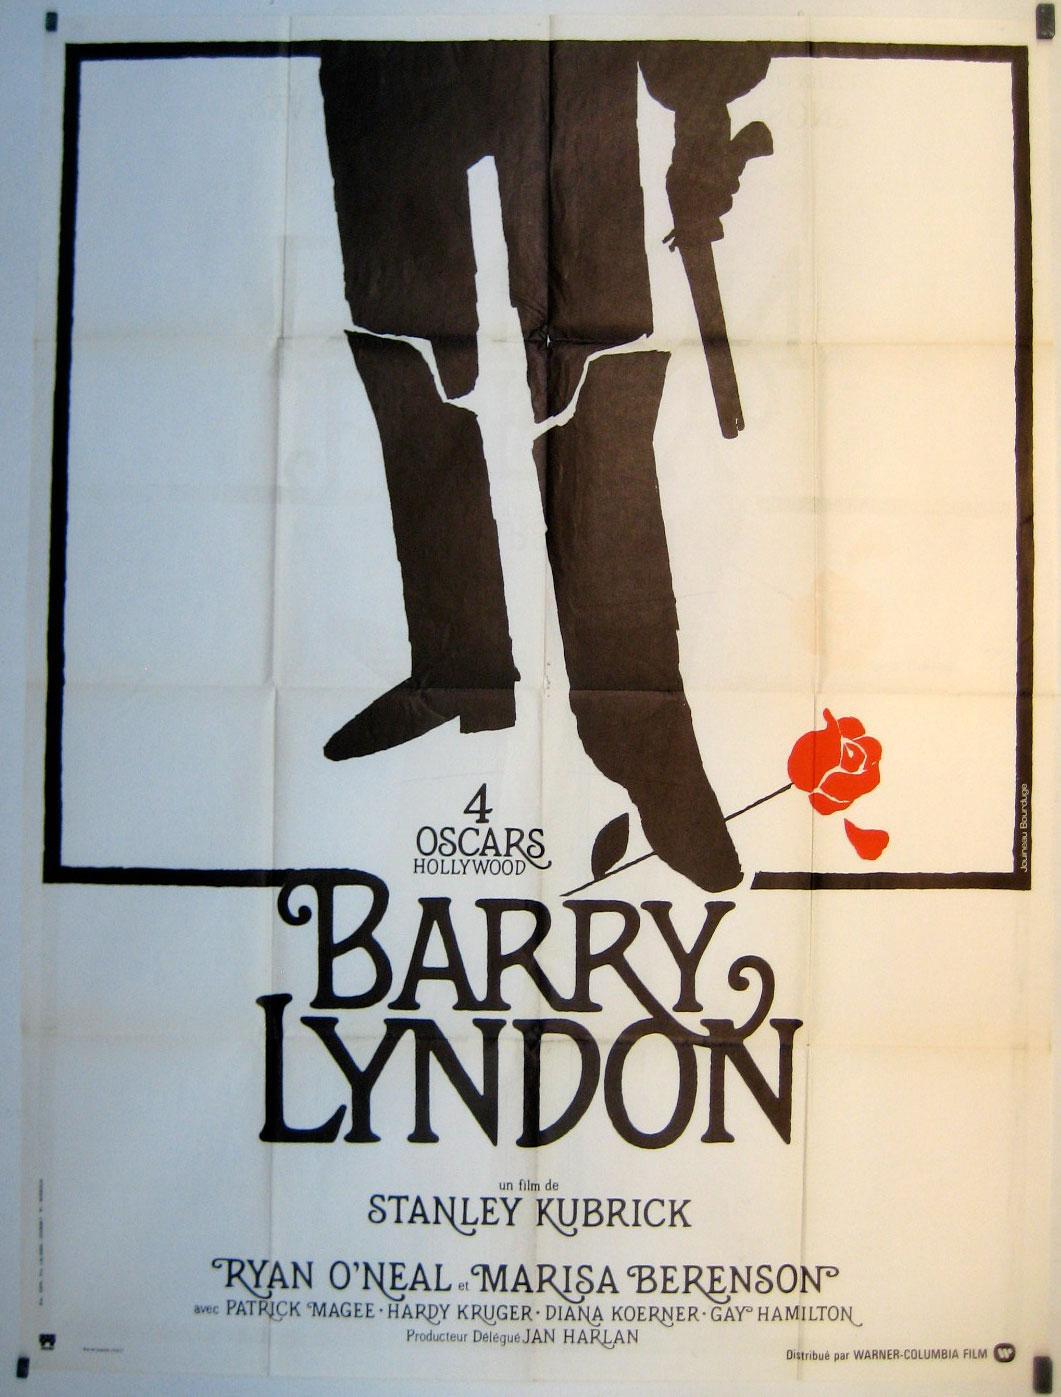 BARRY LYNDON MOVIE POSTER/BARRY LYNDON/POSTER